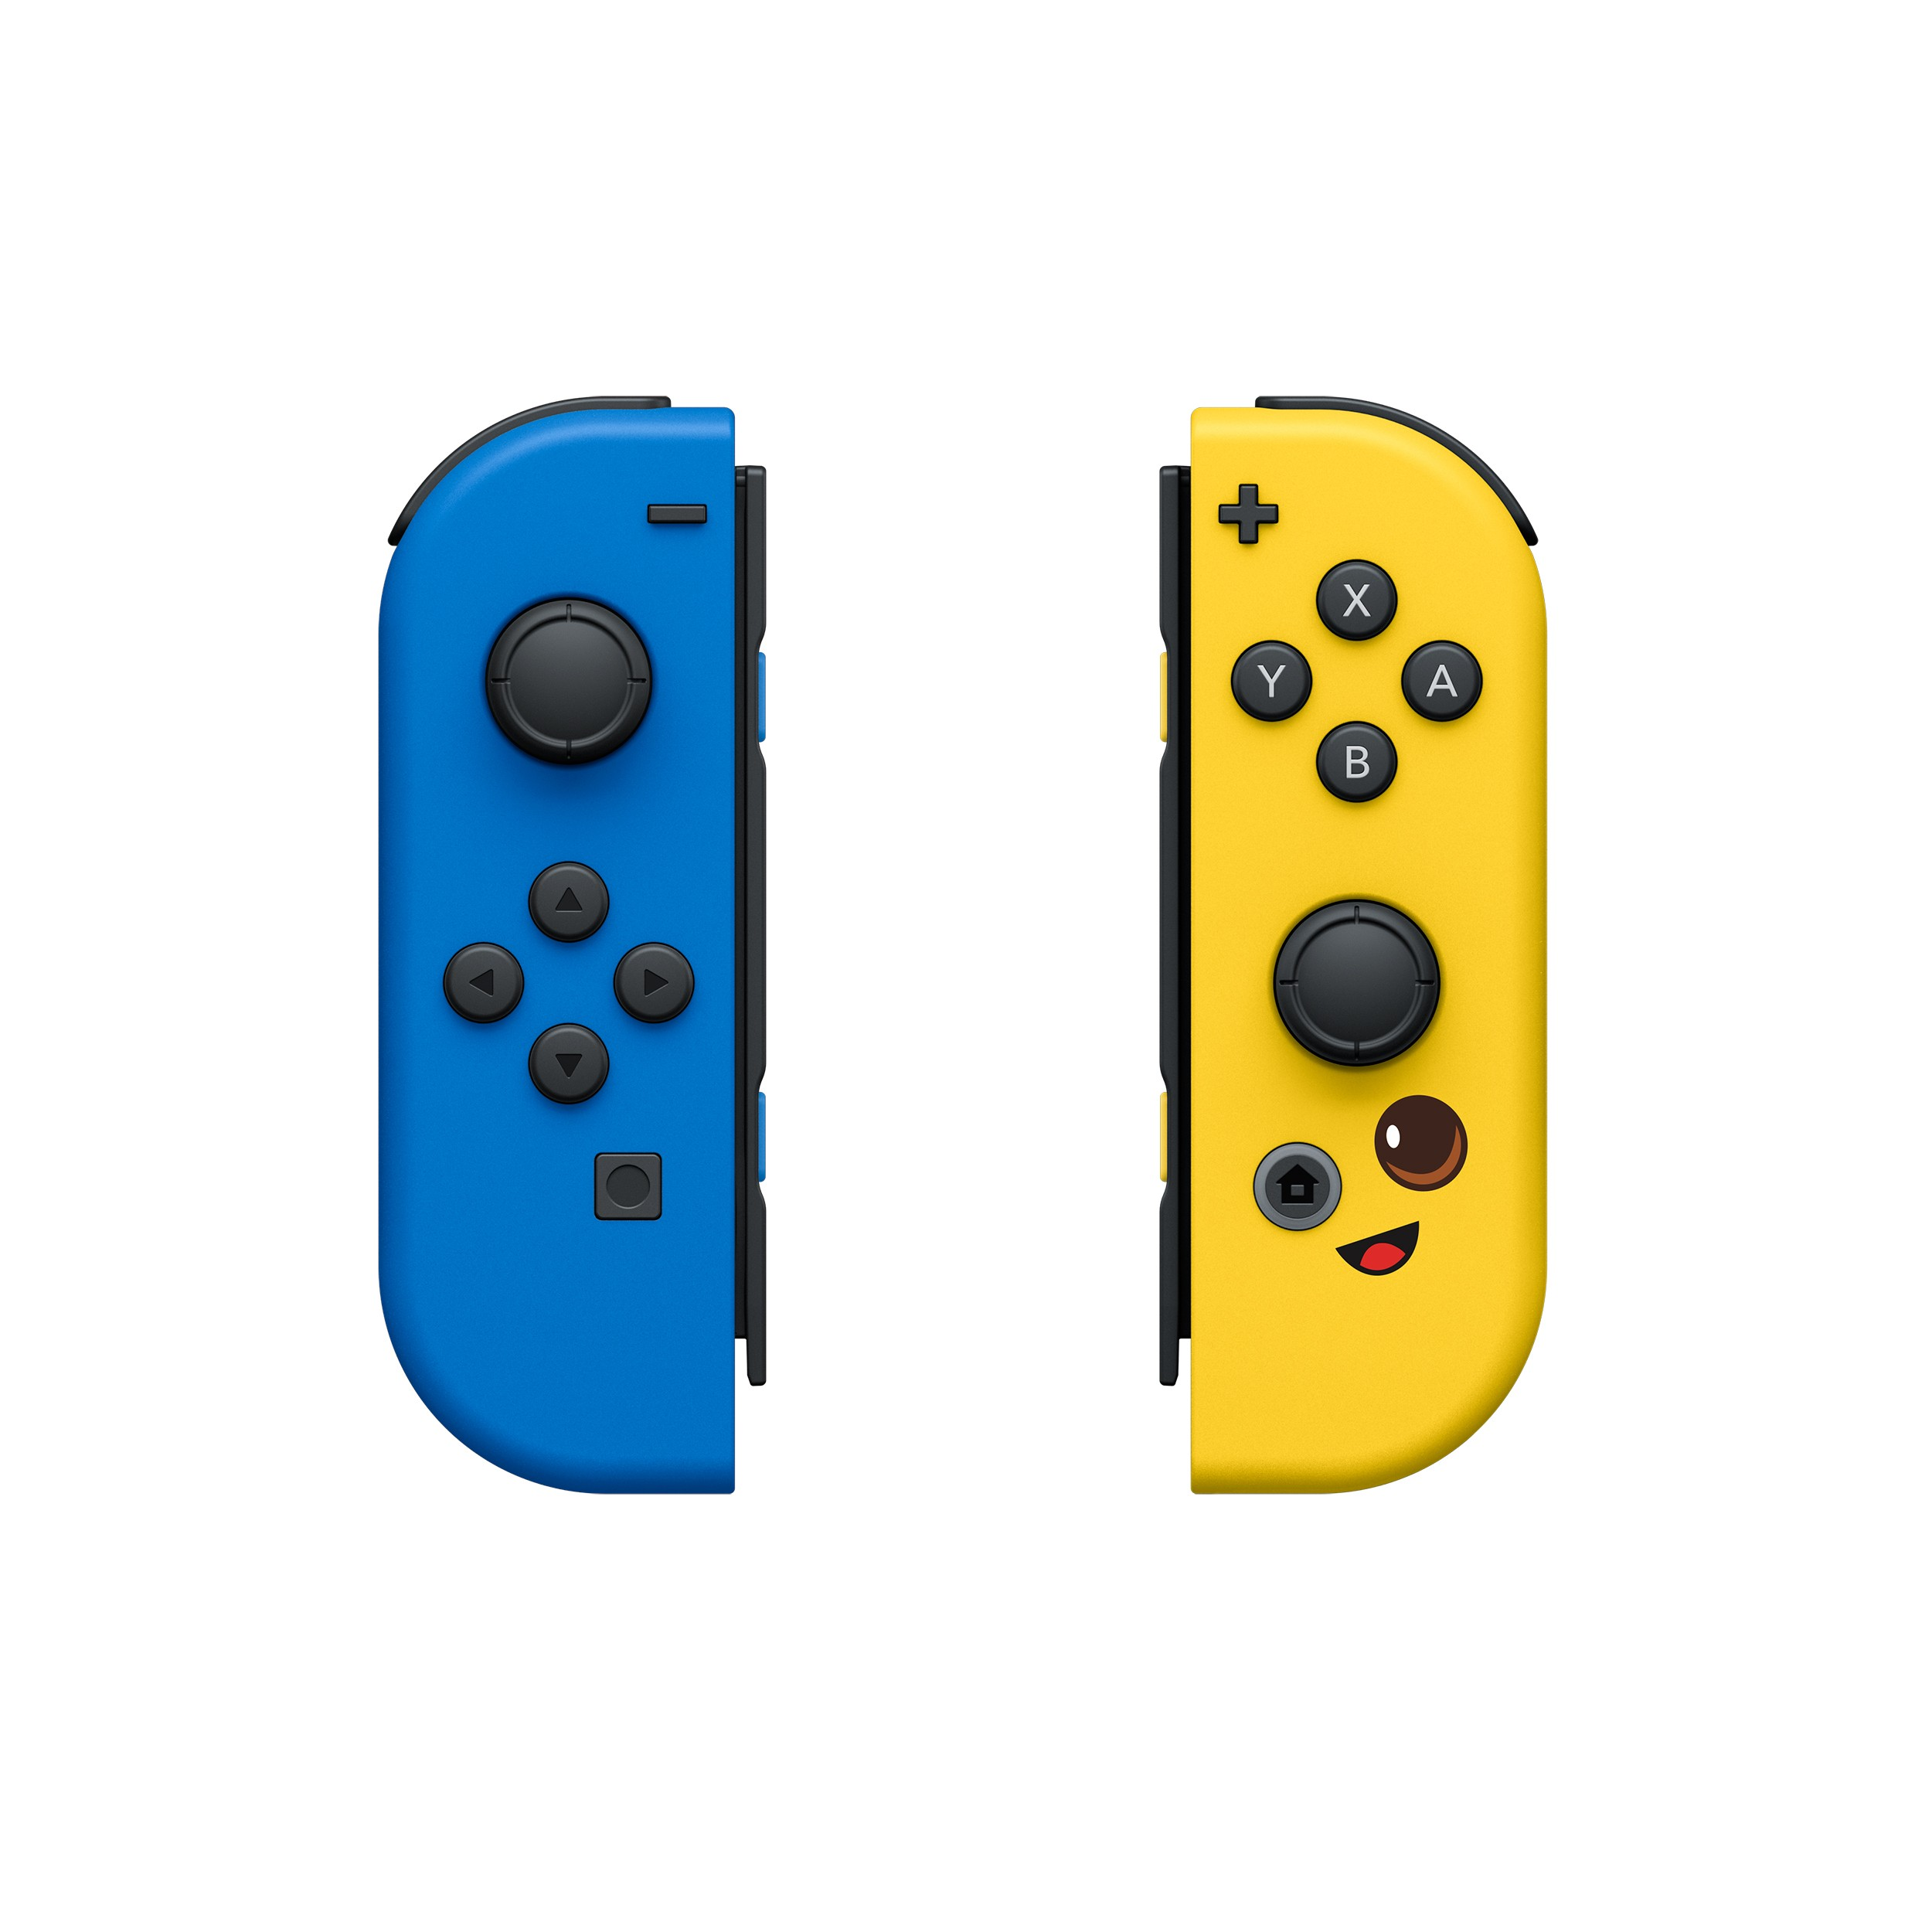 Nintendo Switch Joy-Con pair: Fortnite Edition